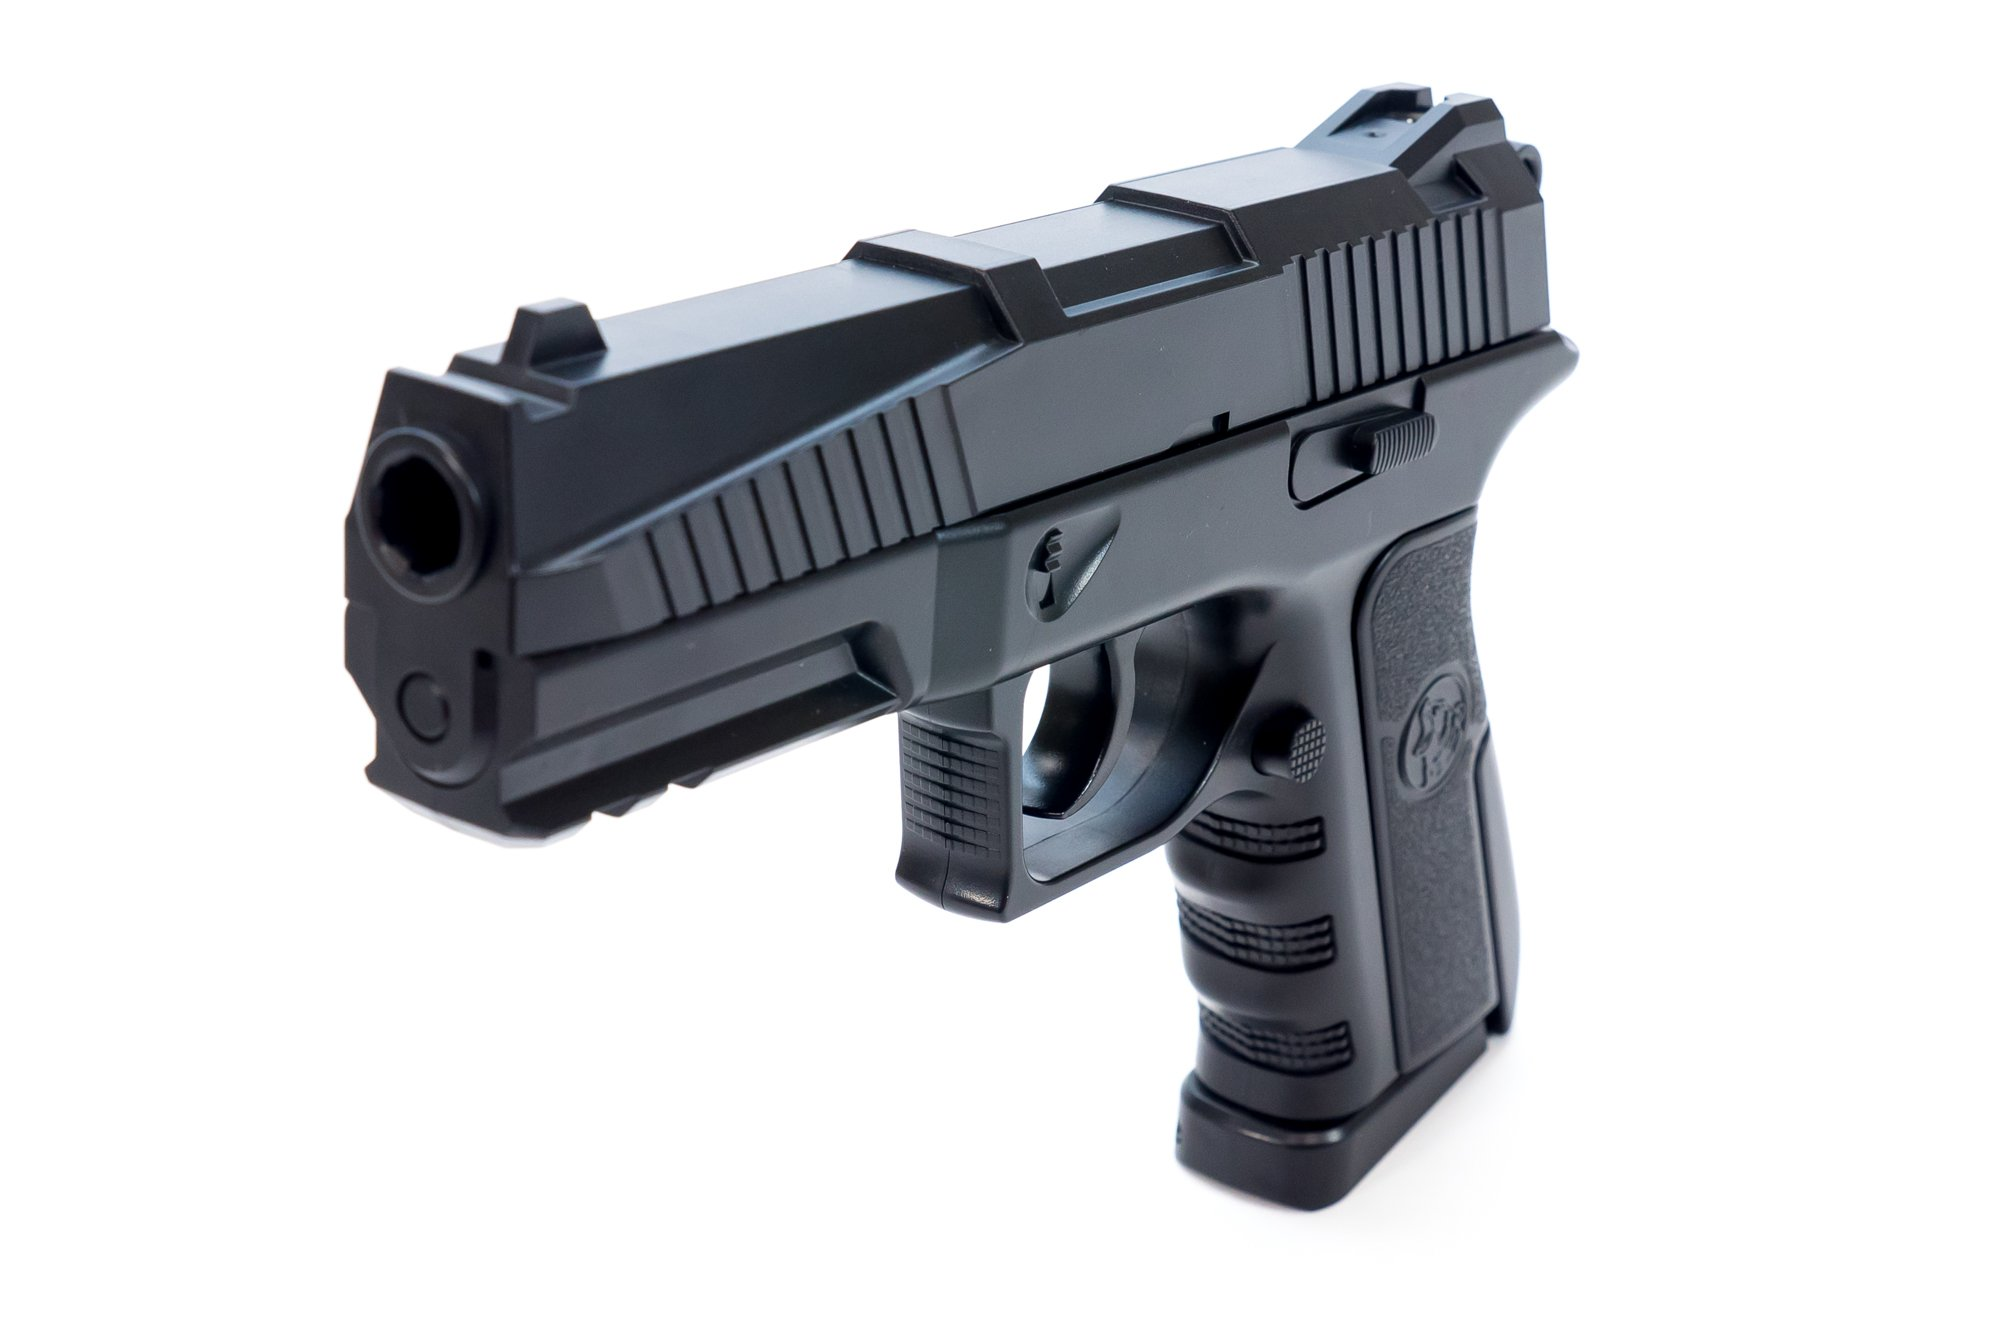 Bear River BR45 Semi-Auto CO2 BB Pistol Airgun Shoots .177 Cal 4.5mm Ammo